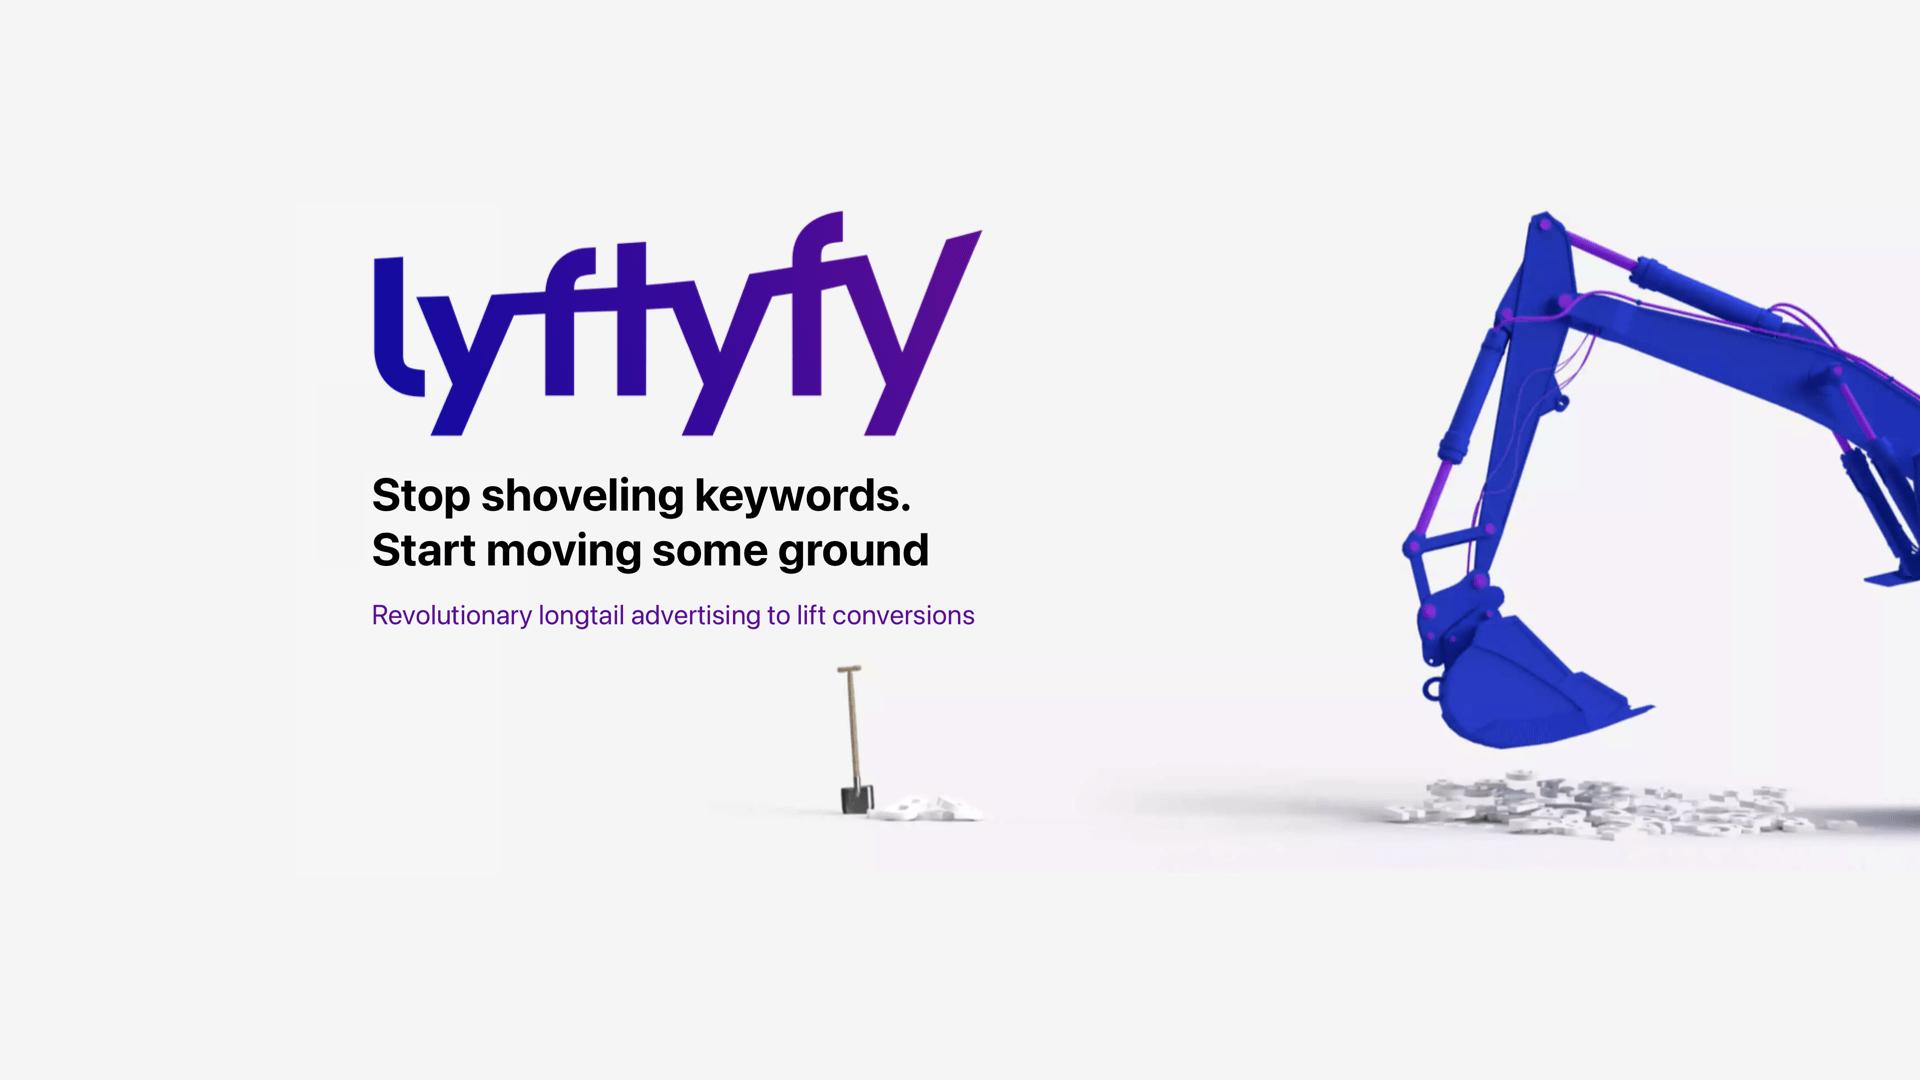 launch-lyftyfy-cover-image